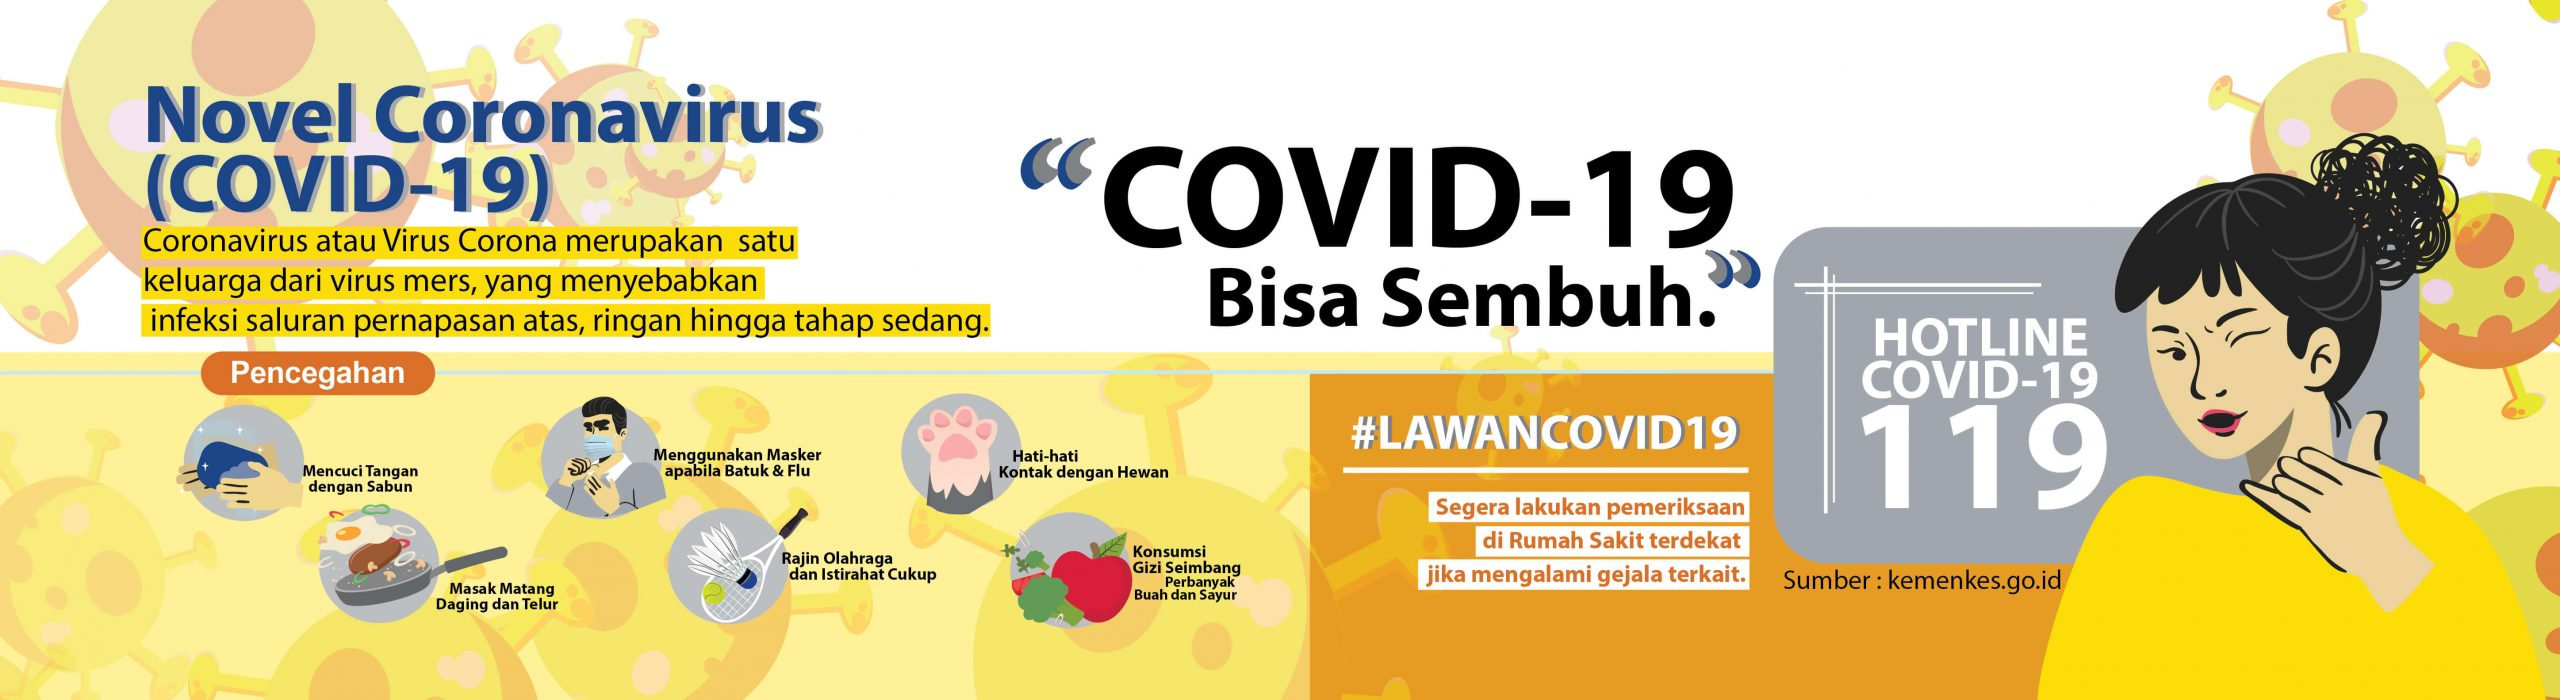 website_corona2.2-01_1